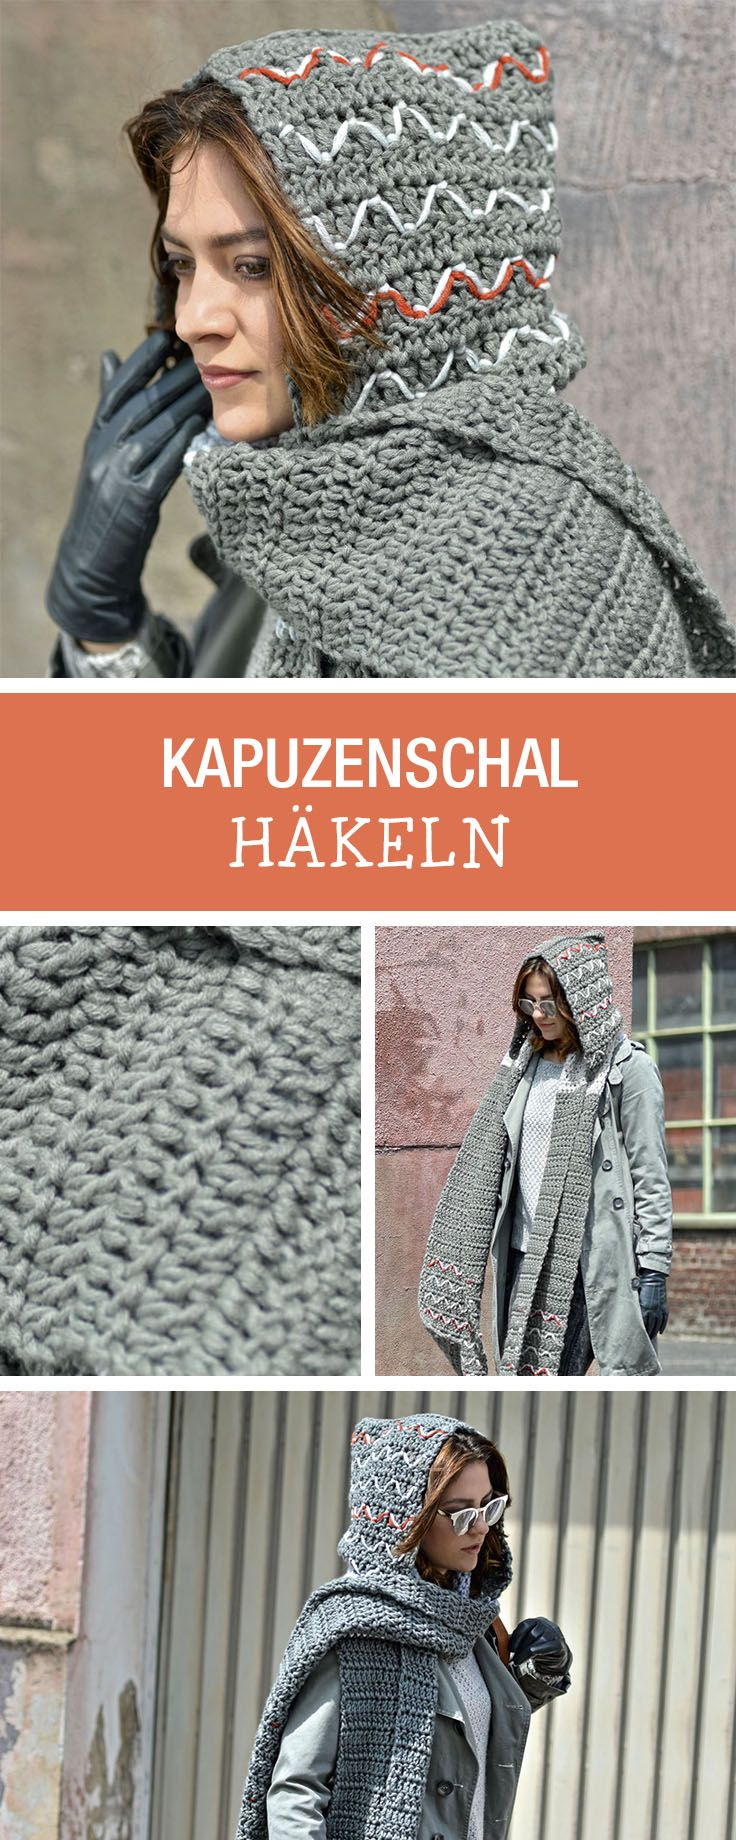 DIY-Anleitung: Modetrend für Herbstsaison, Kapuzenschal selbst häkeln / DIY tutorial: fashion trend for fall season, crocheting hooded scarf via DaWanda.com